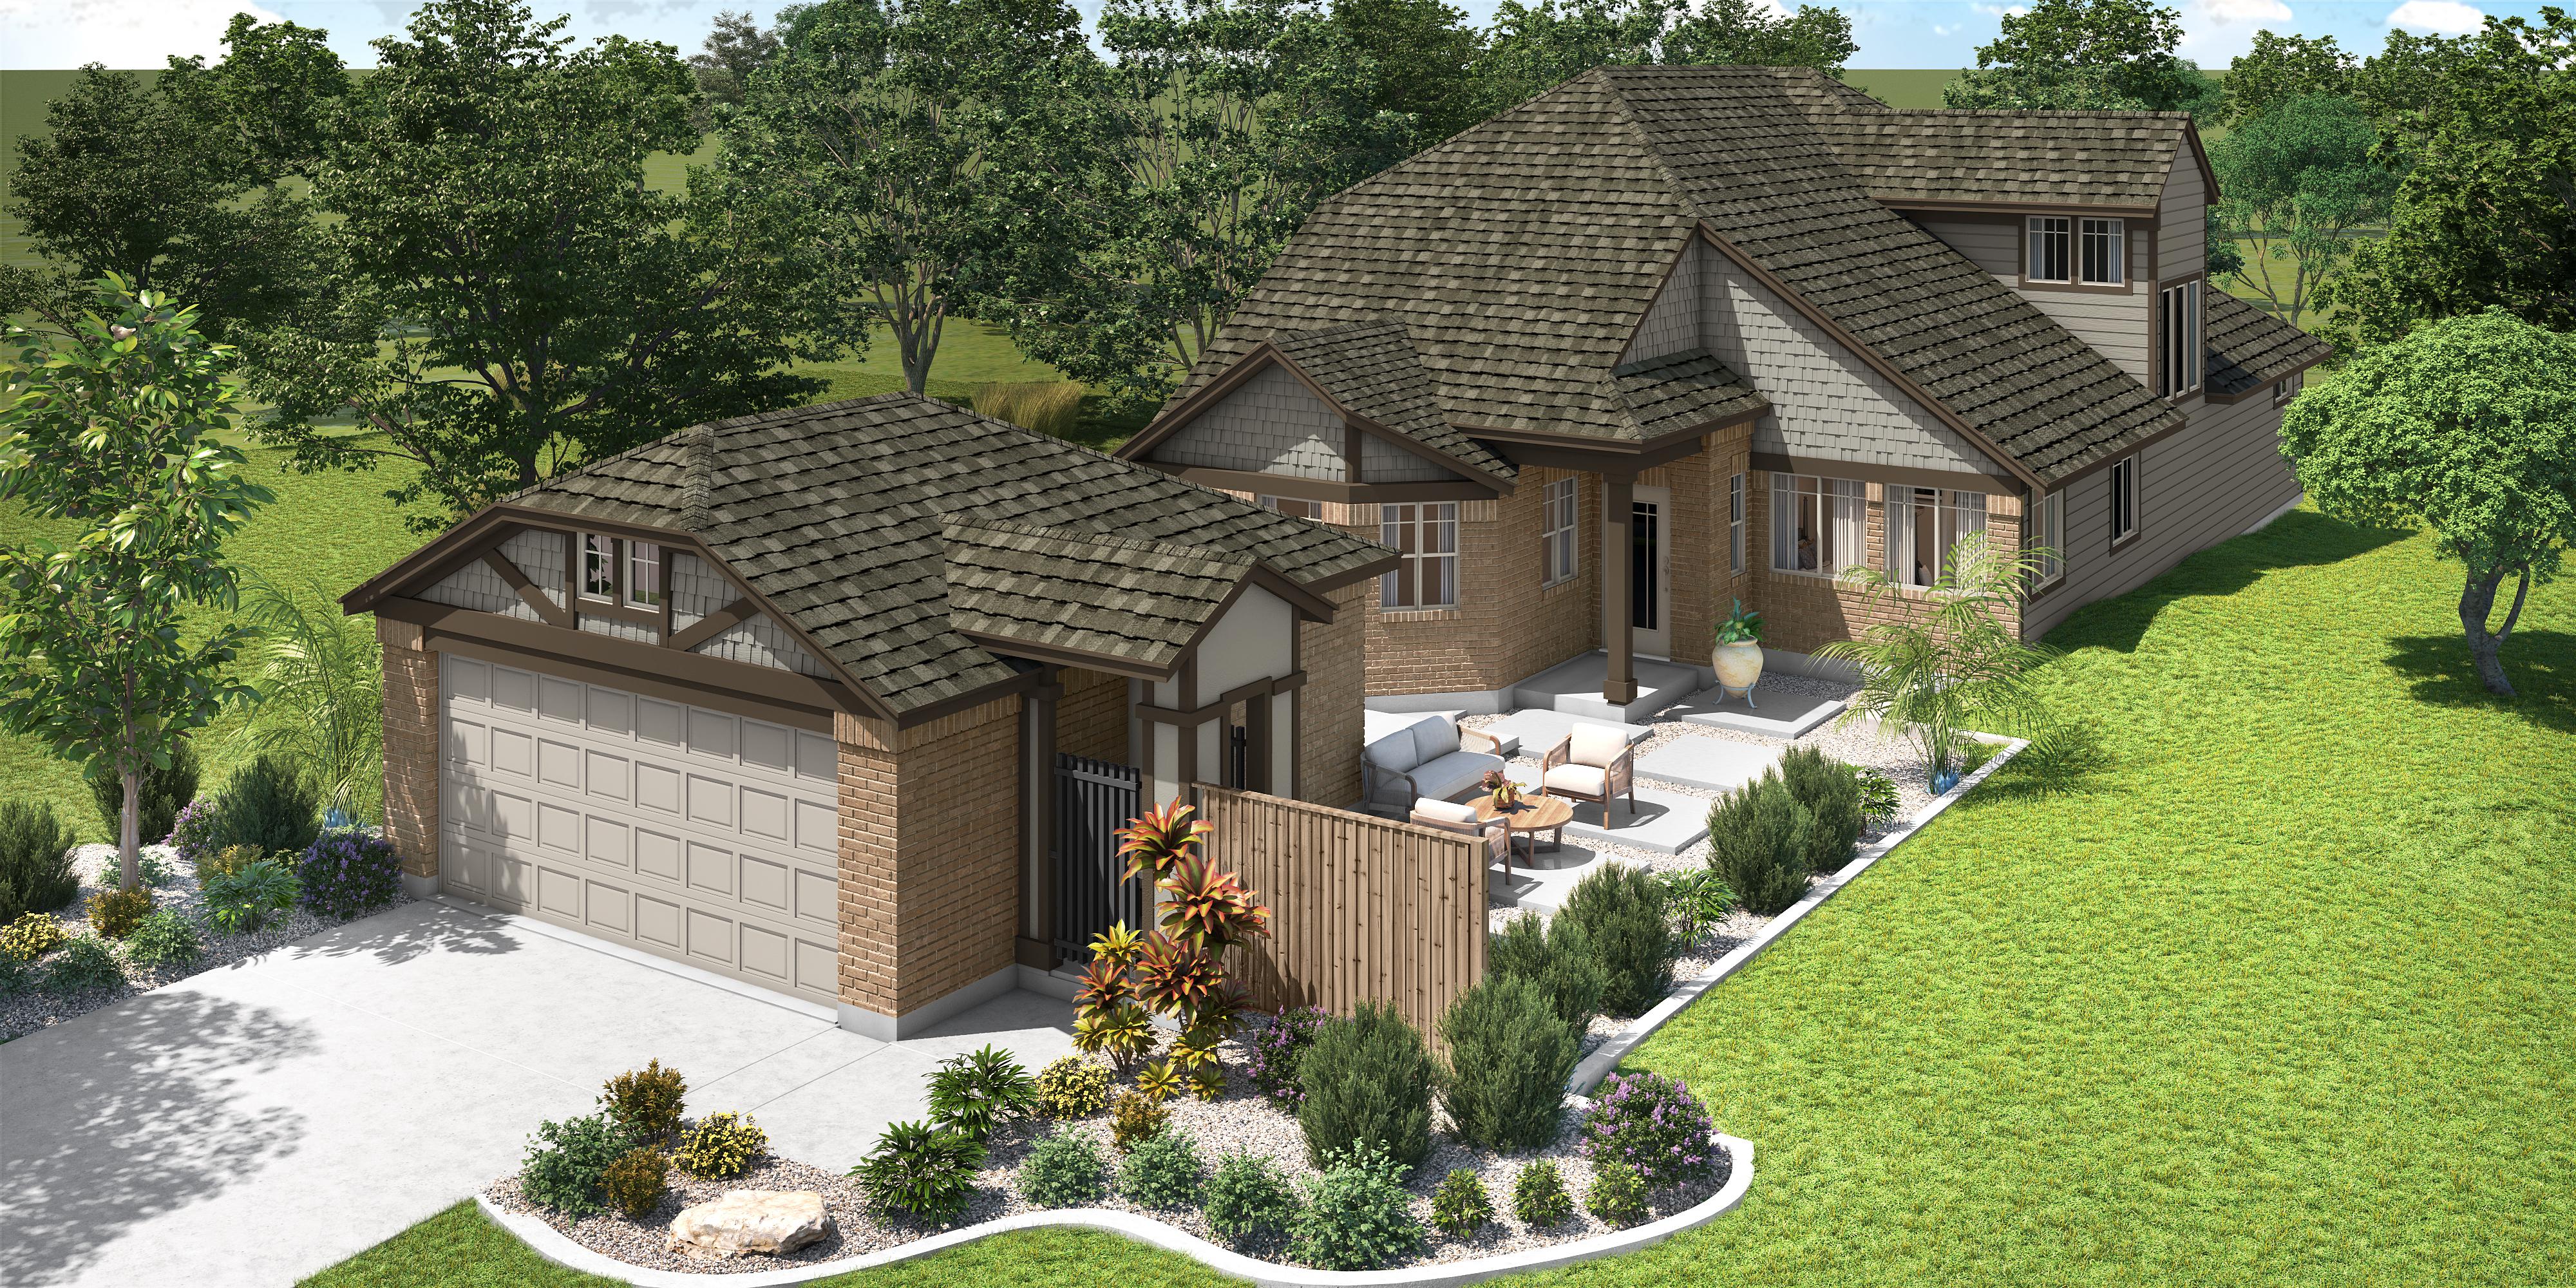 BS_RK_Pacesetter - Austin - Courtyard plan rev_Campania-A_03